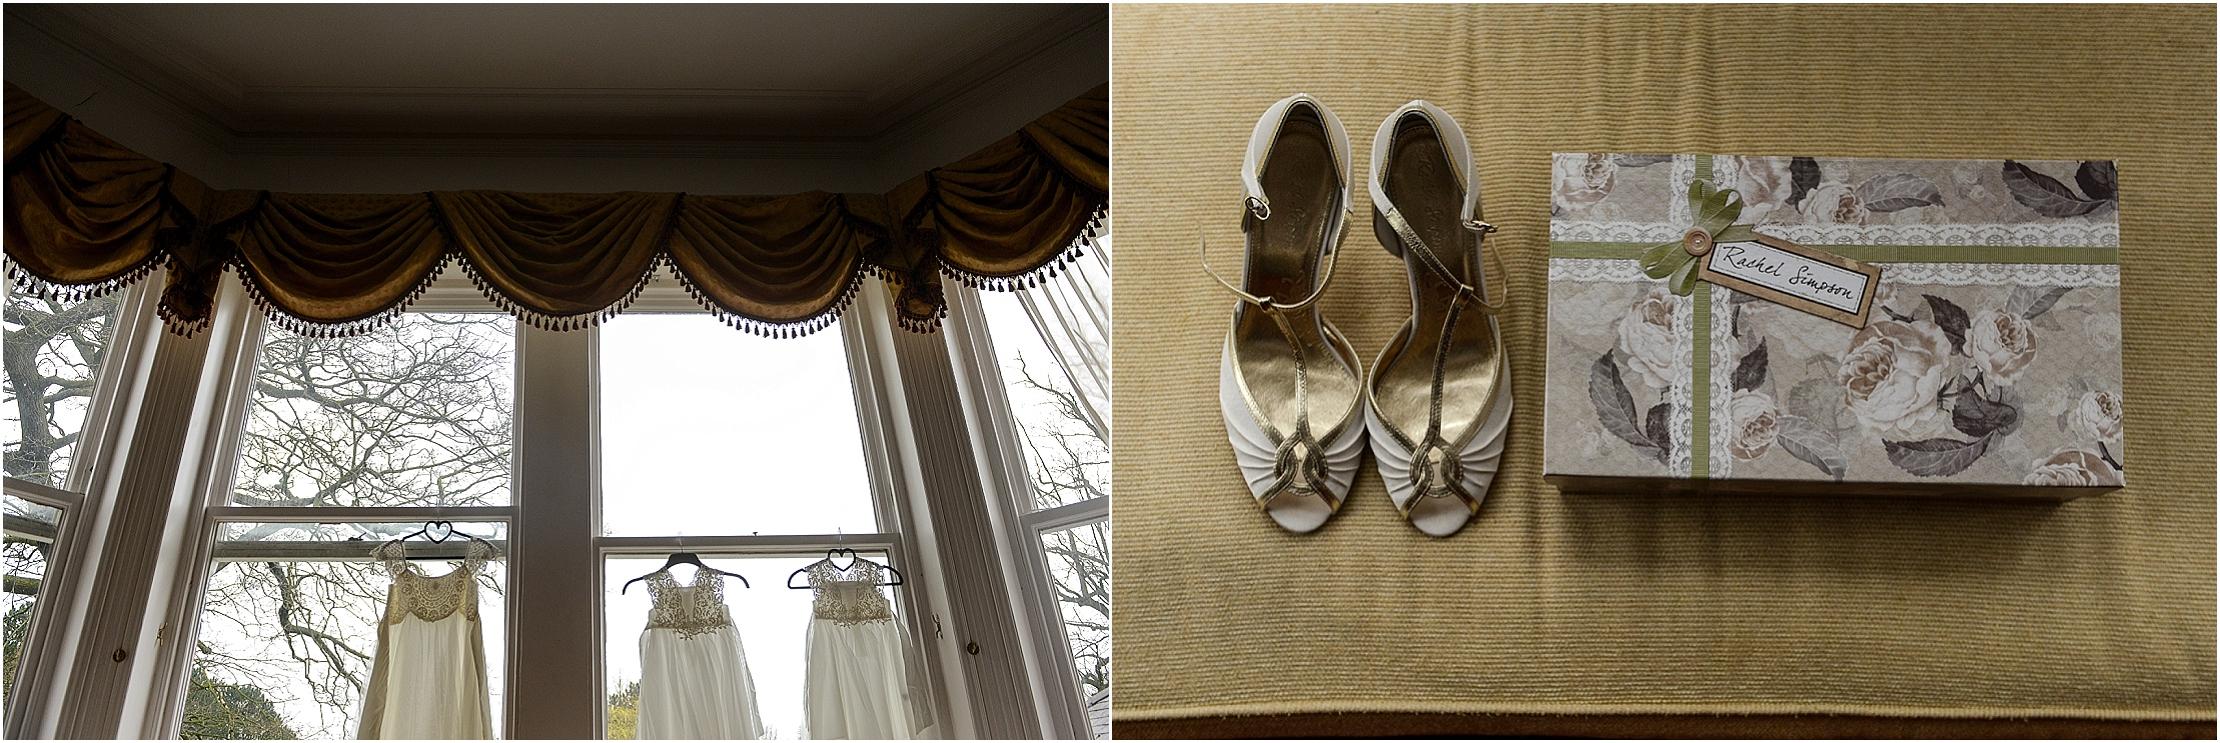 farington-lodge-wedding-16.jpg